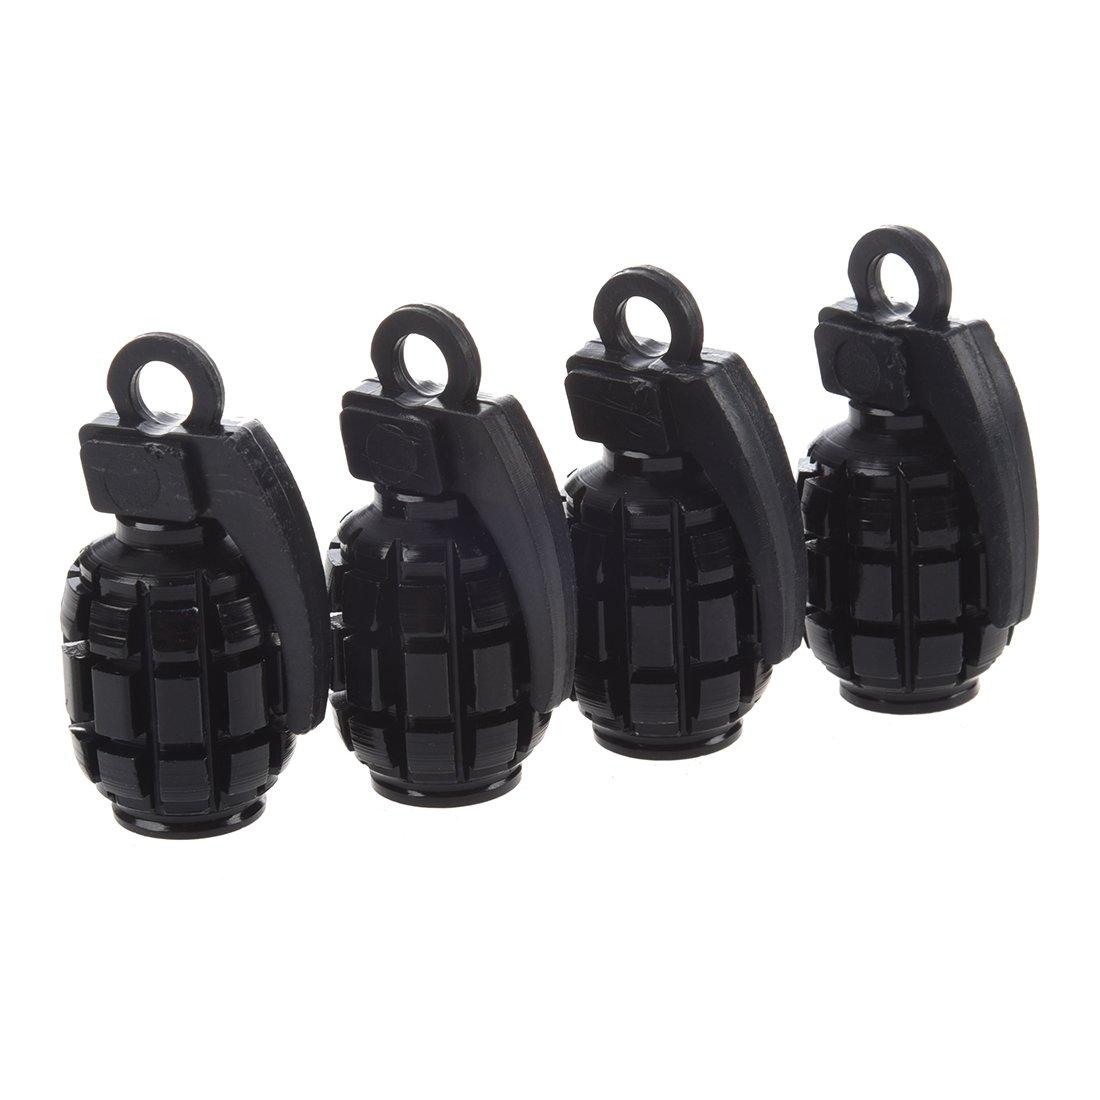 TOOGOO(R) 4 Pcs Metal Plastic Pure Black Grenade Shape Car Tire Valve Cap